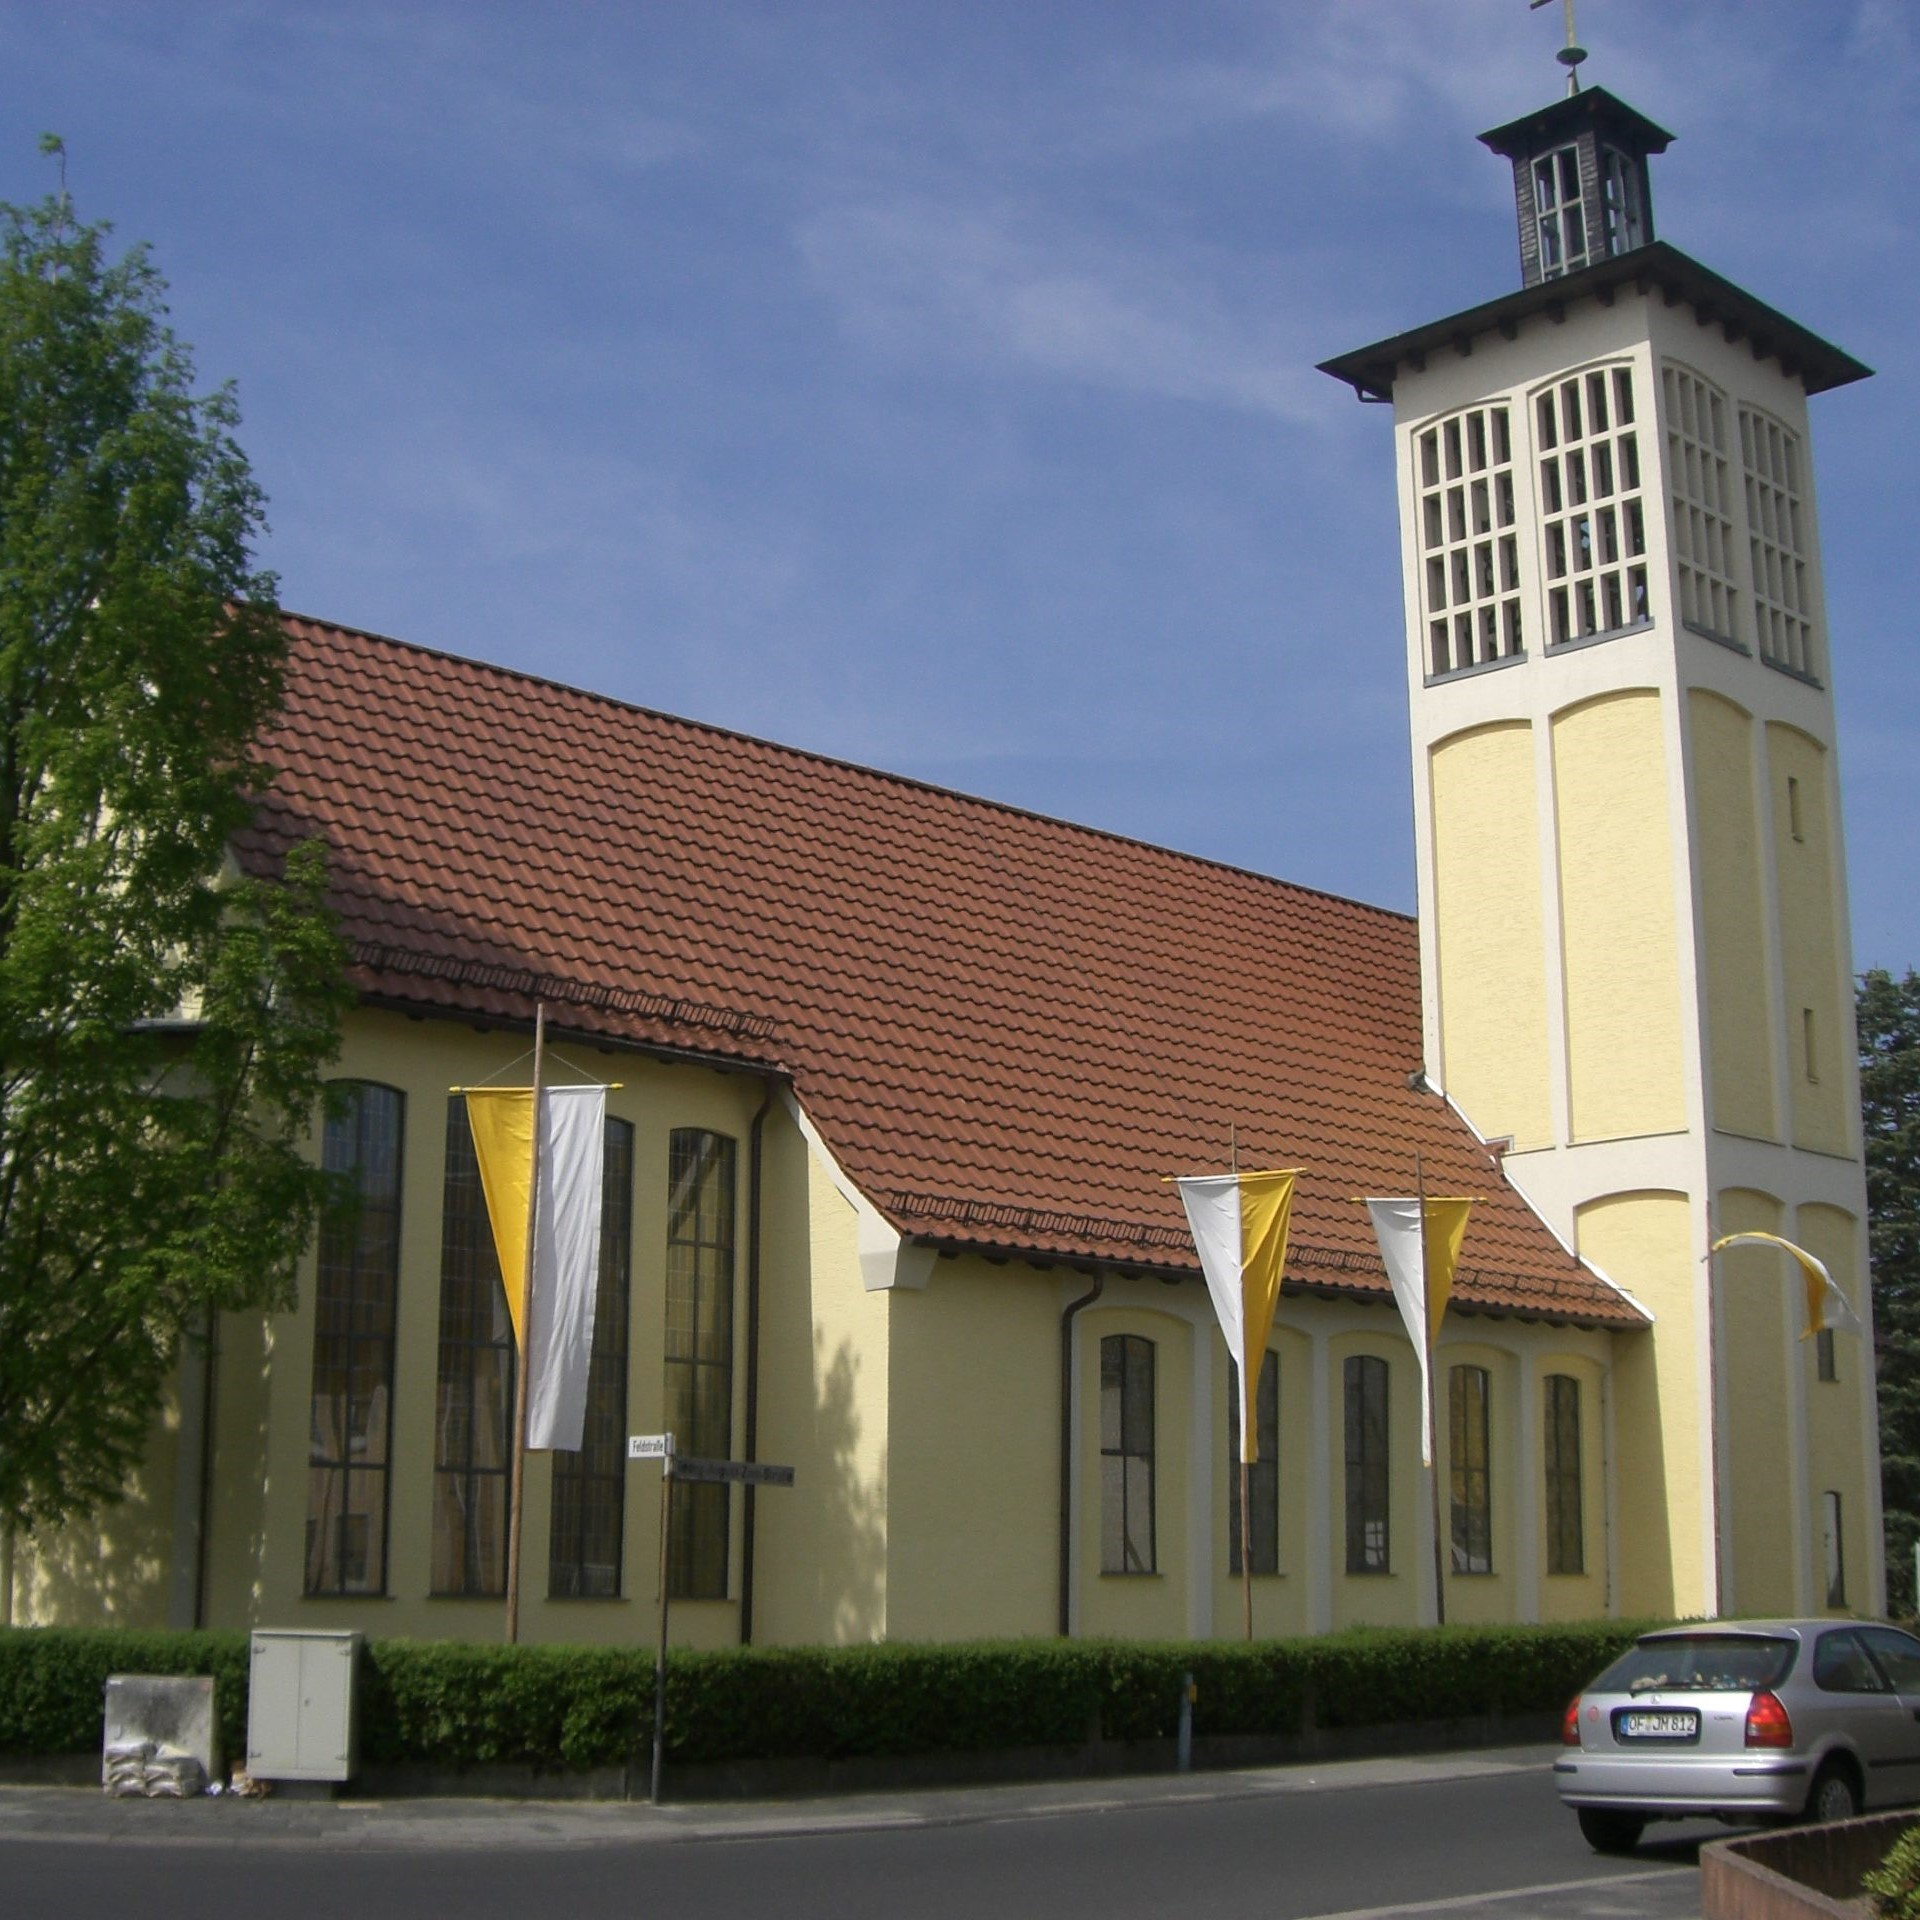 Christi Himmelfahrt Hochfest